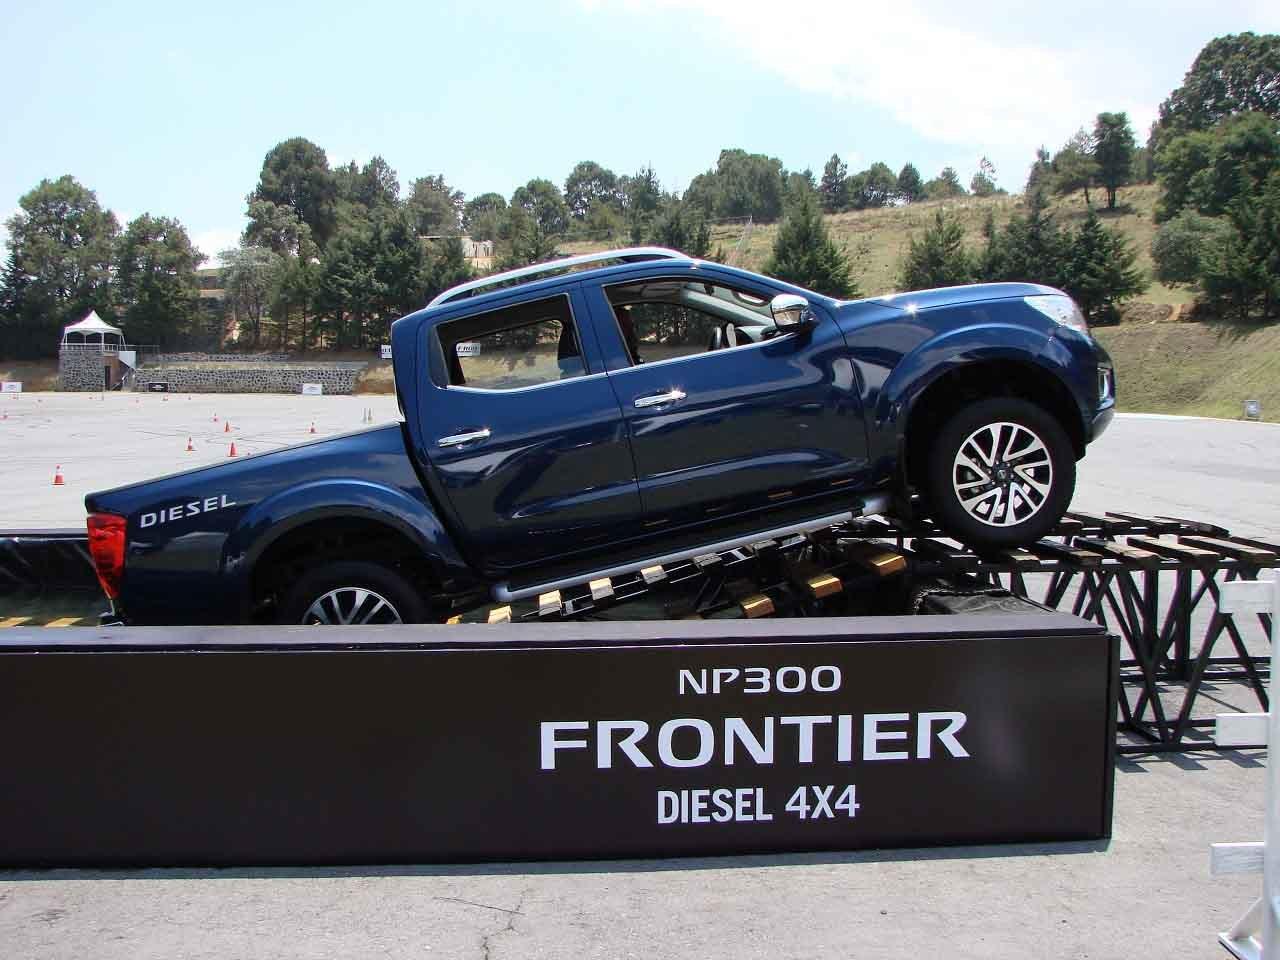 Nissan NP300 Frontier Diésel 4x4 prueba México (7/31)